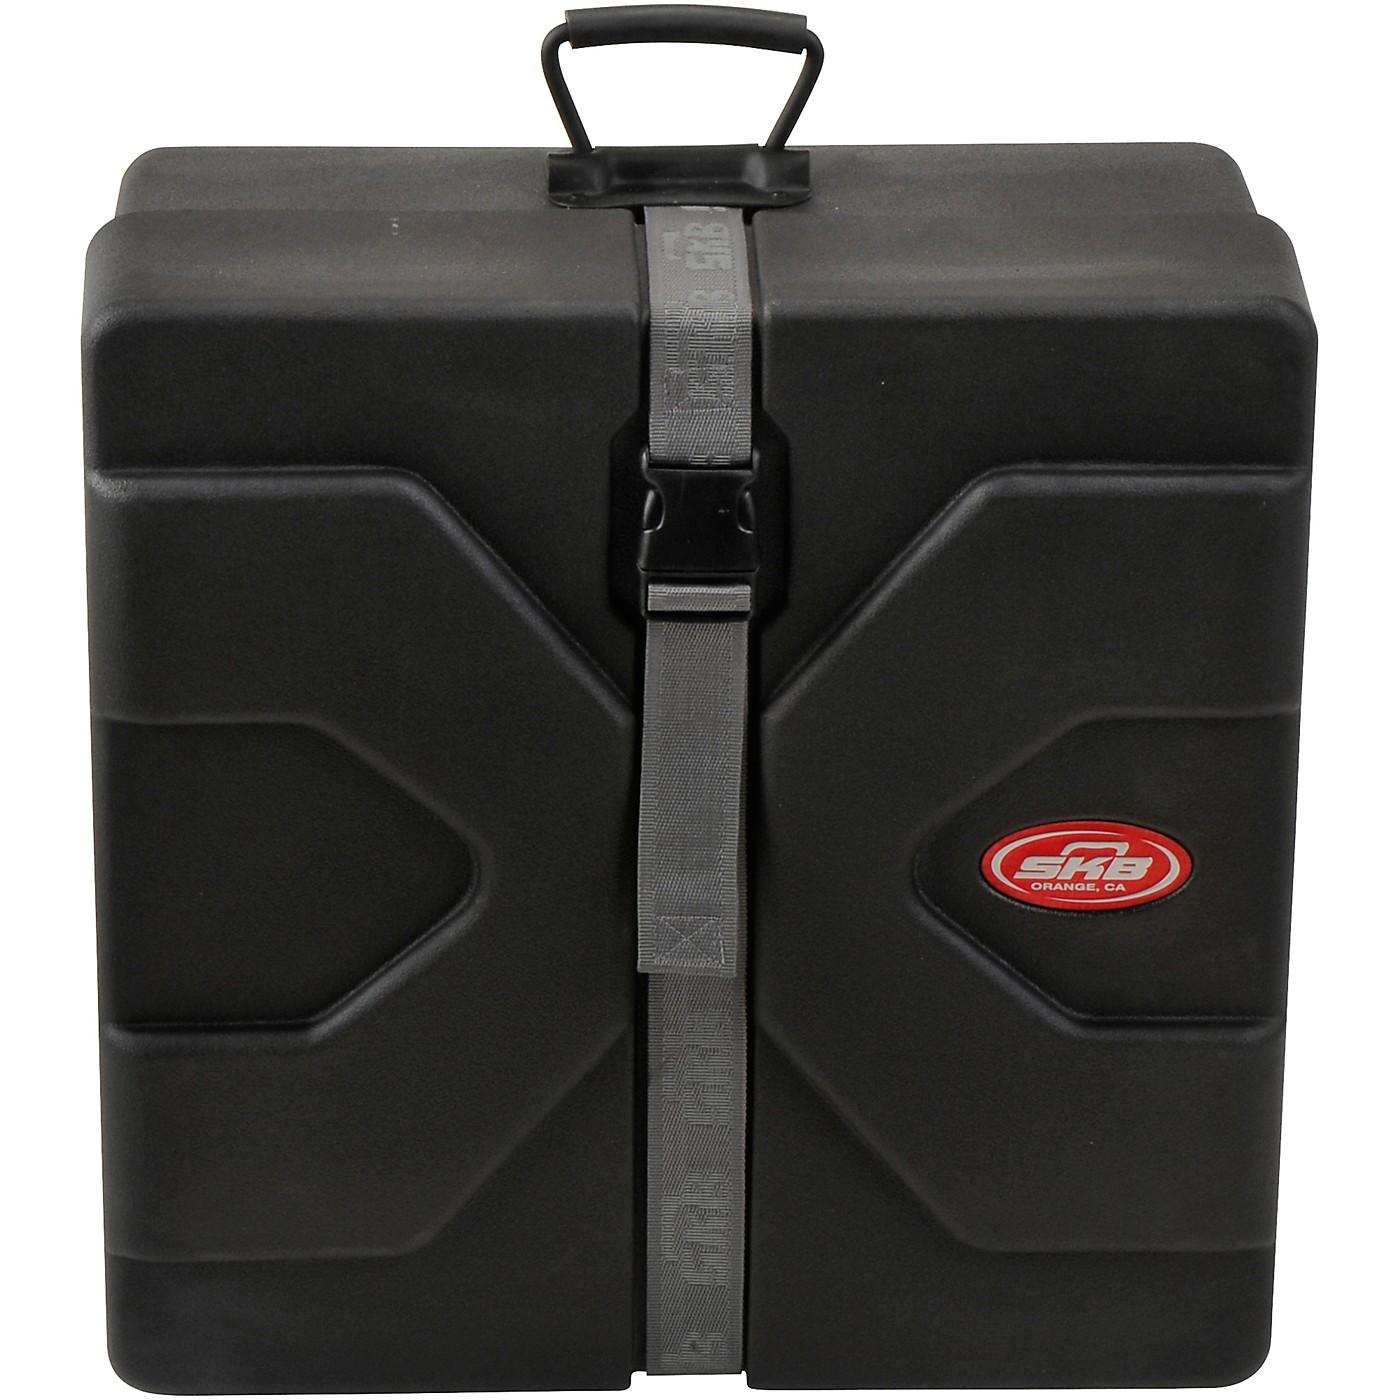 SKB Roto Snare Drum Case thumbnail